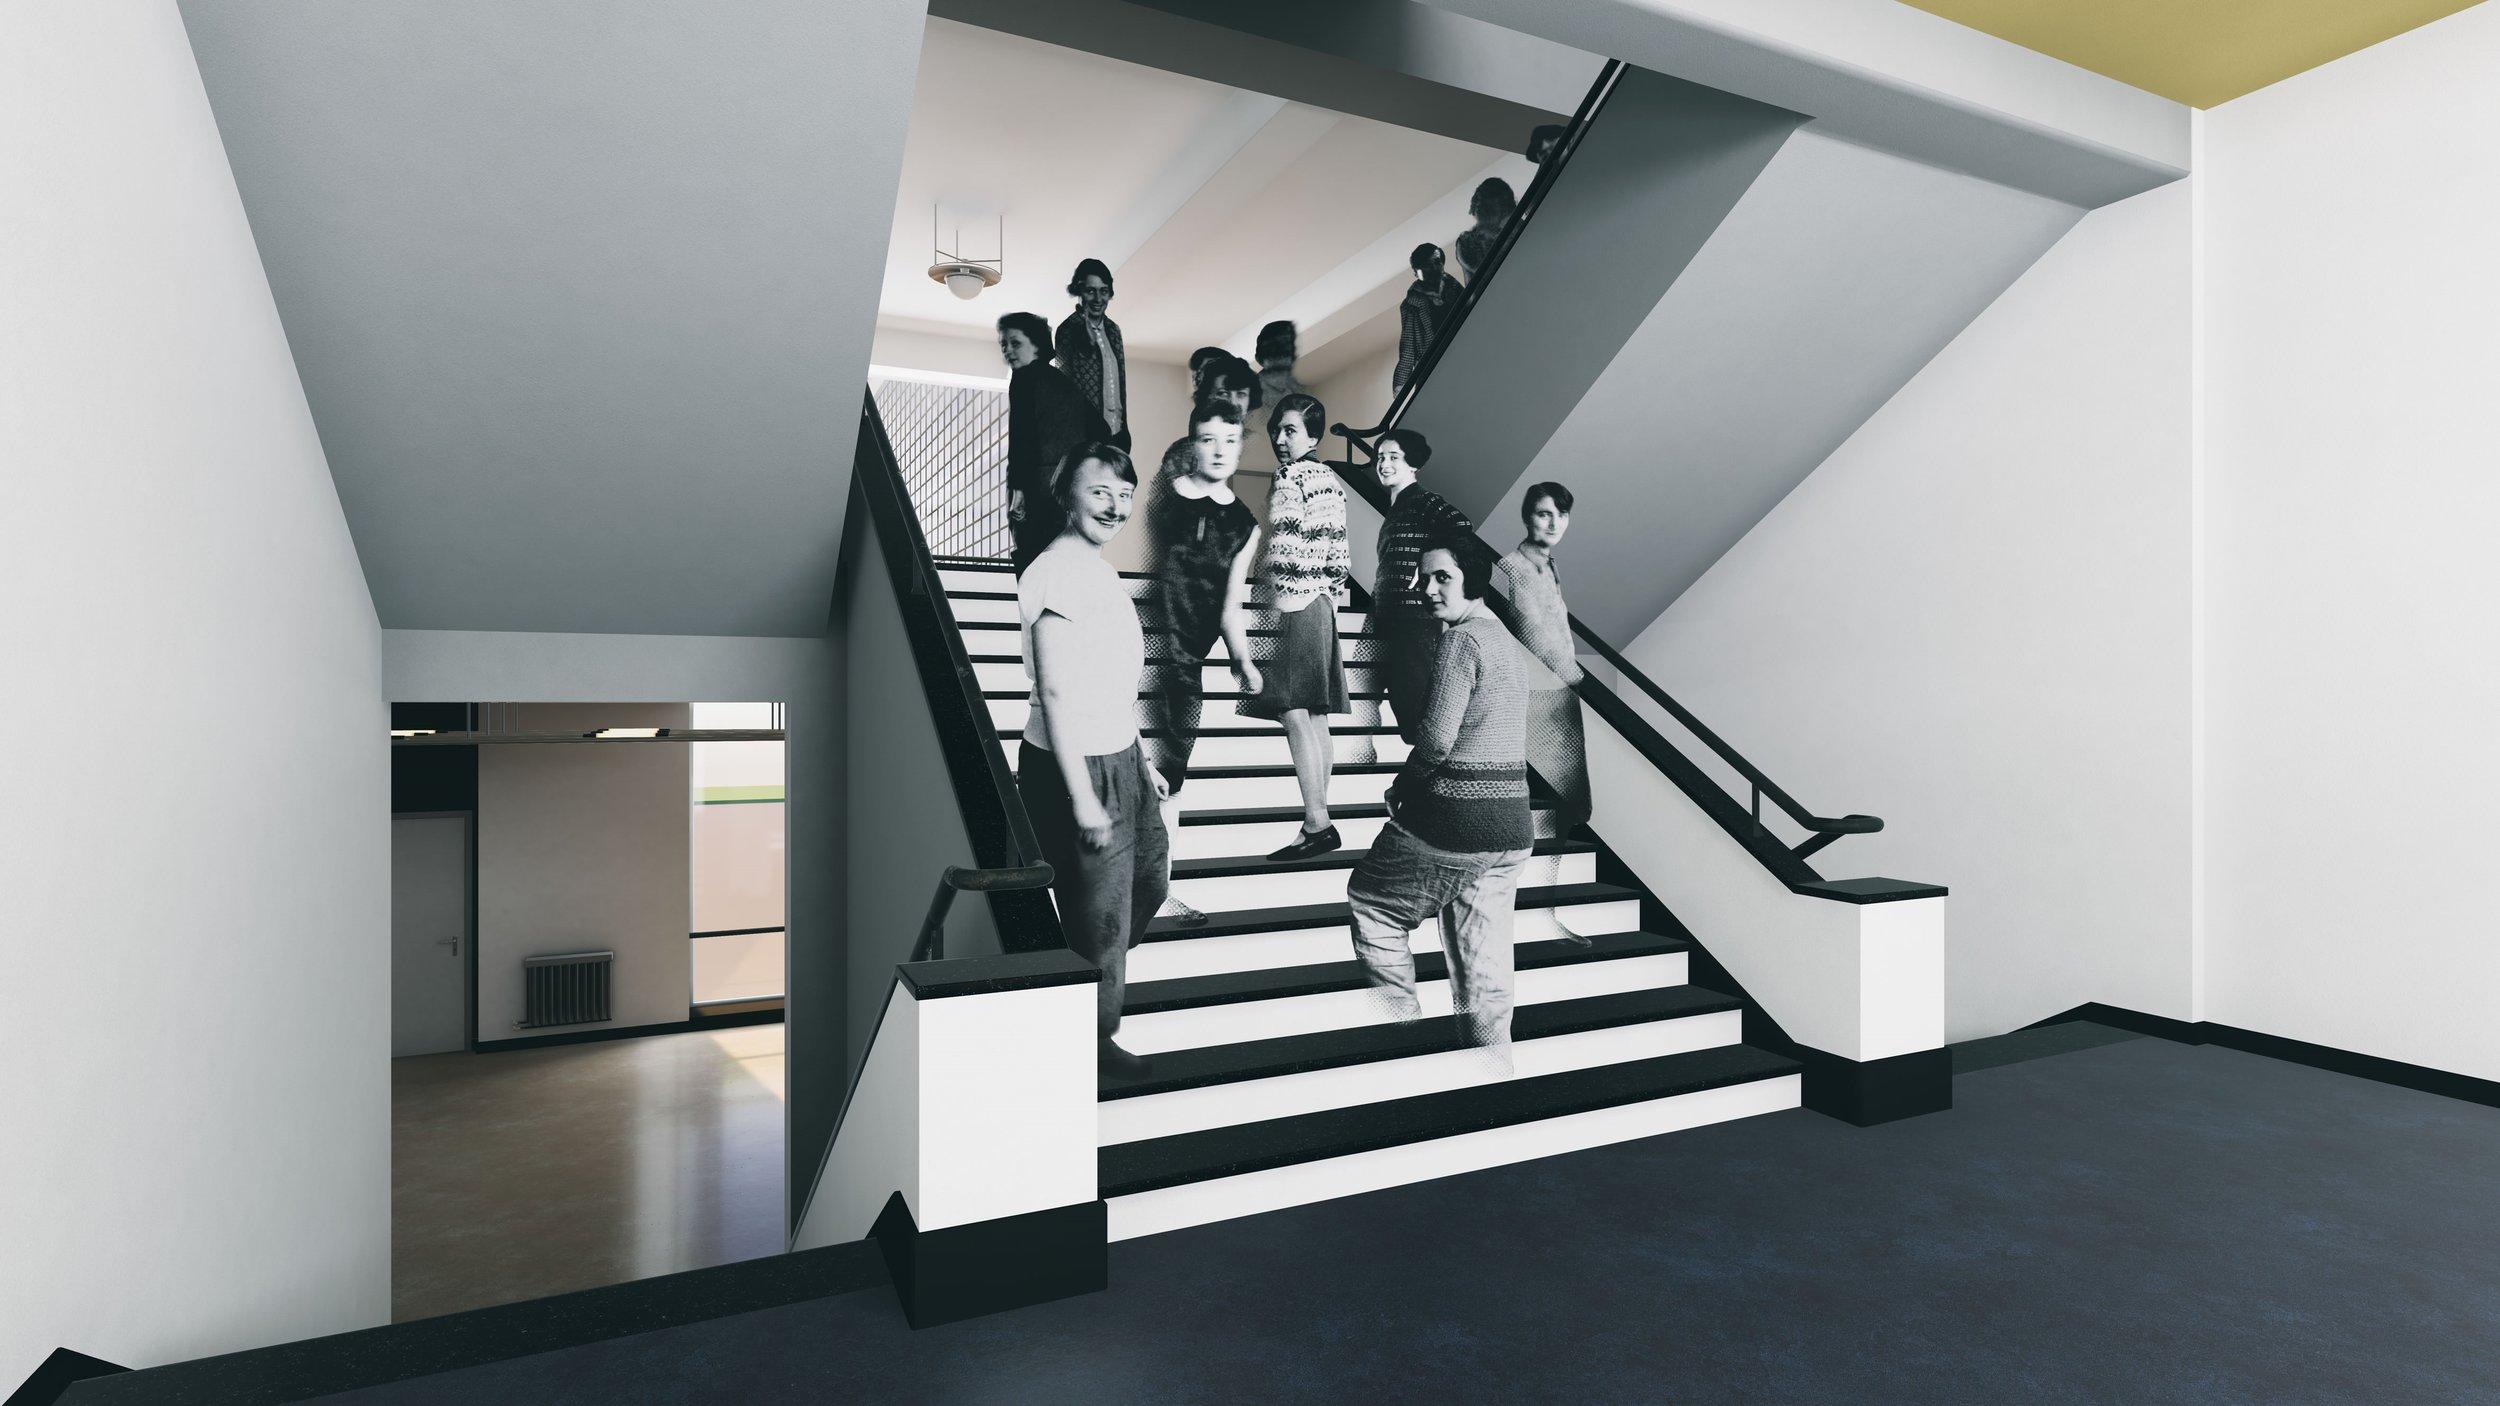 VB_StairCase.jpg